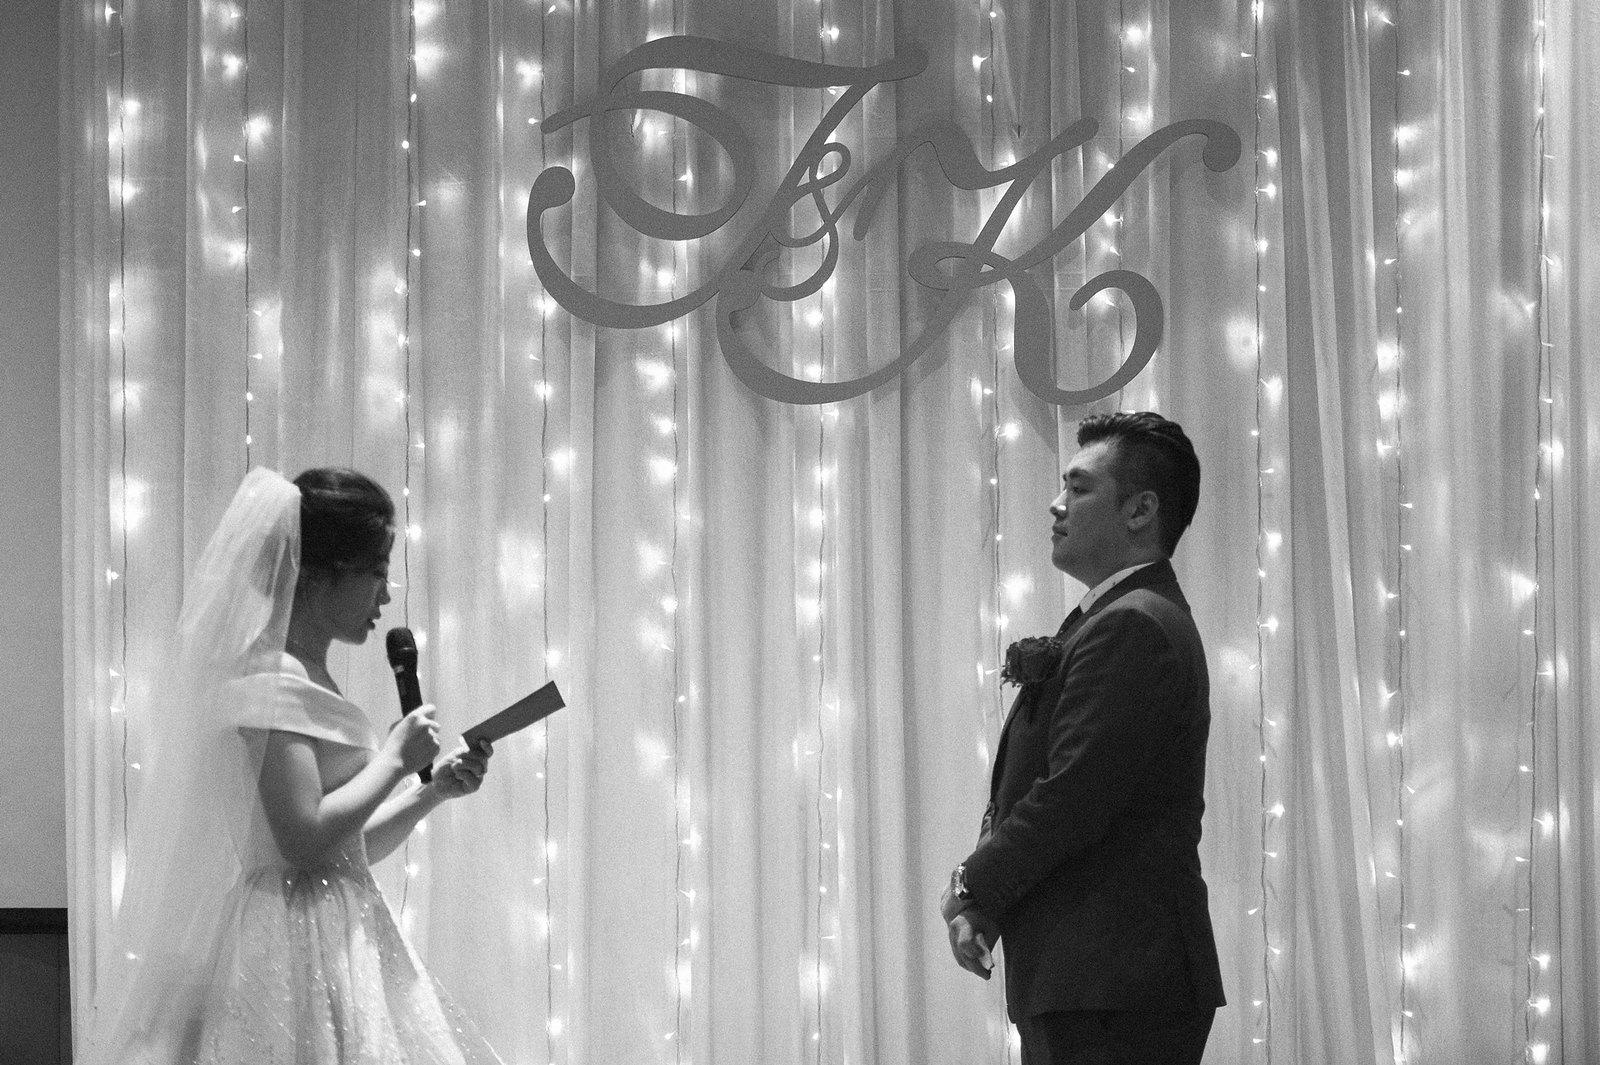 【婚攝】Ted & Karen / 台北萬豪酒店 Taipei Marriott Hotel